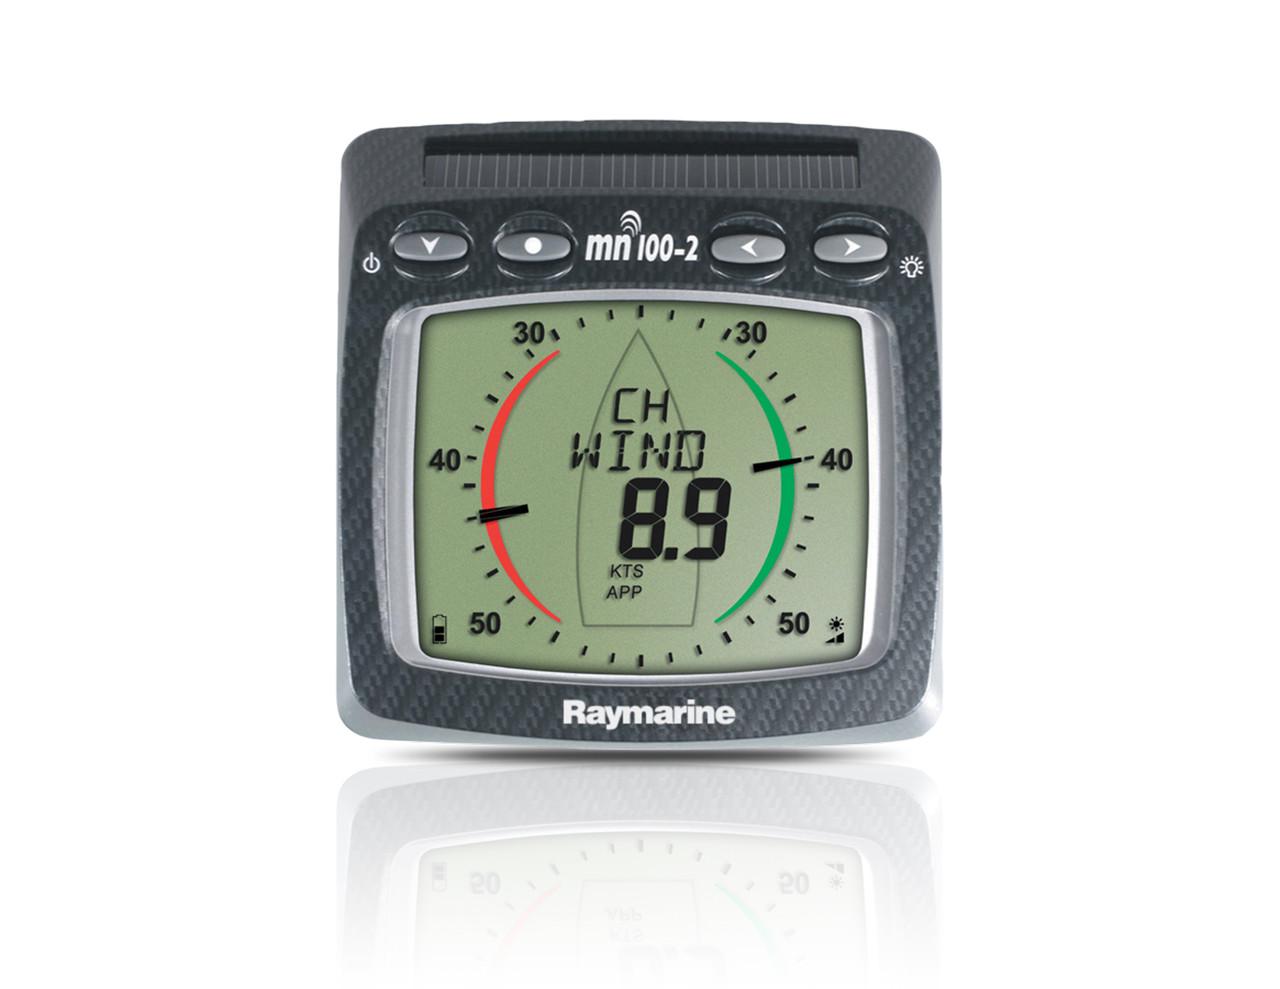 Raymarine Wireless Multi Analogue Display Instrument